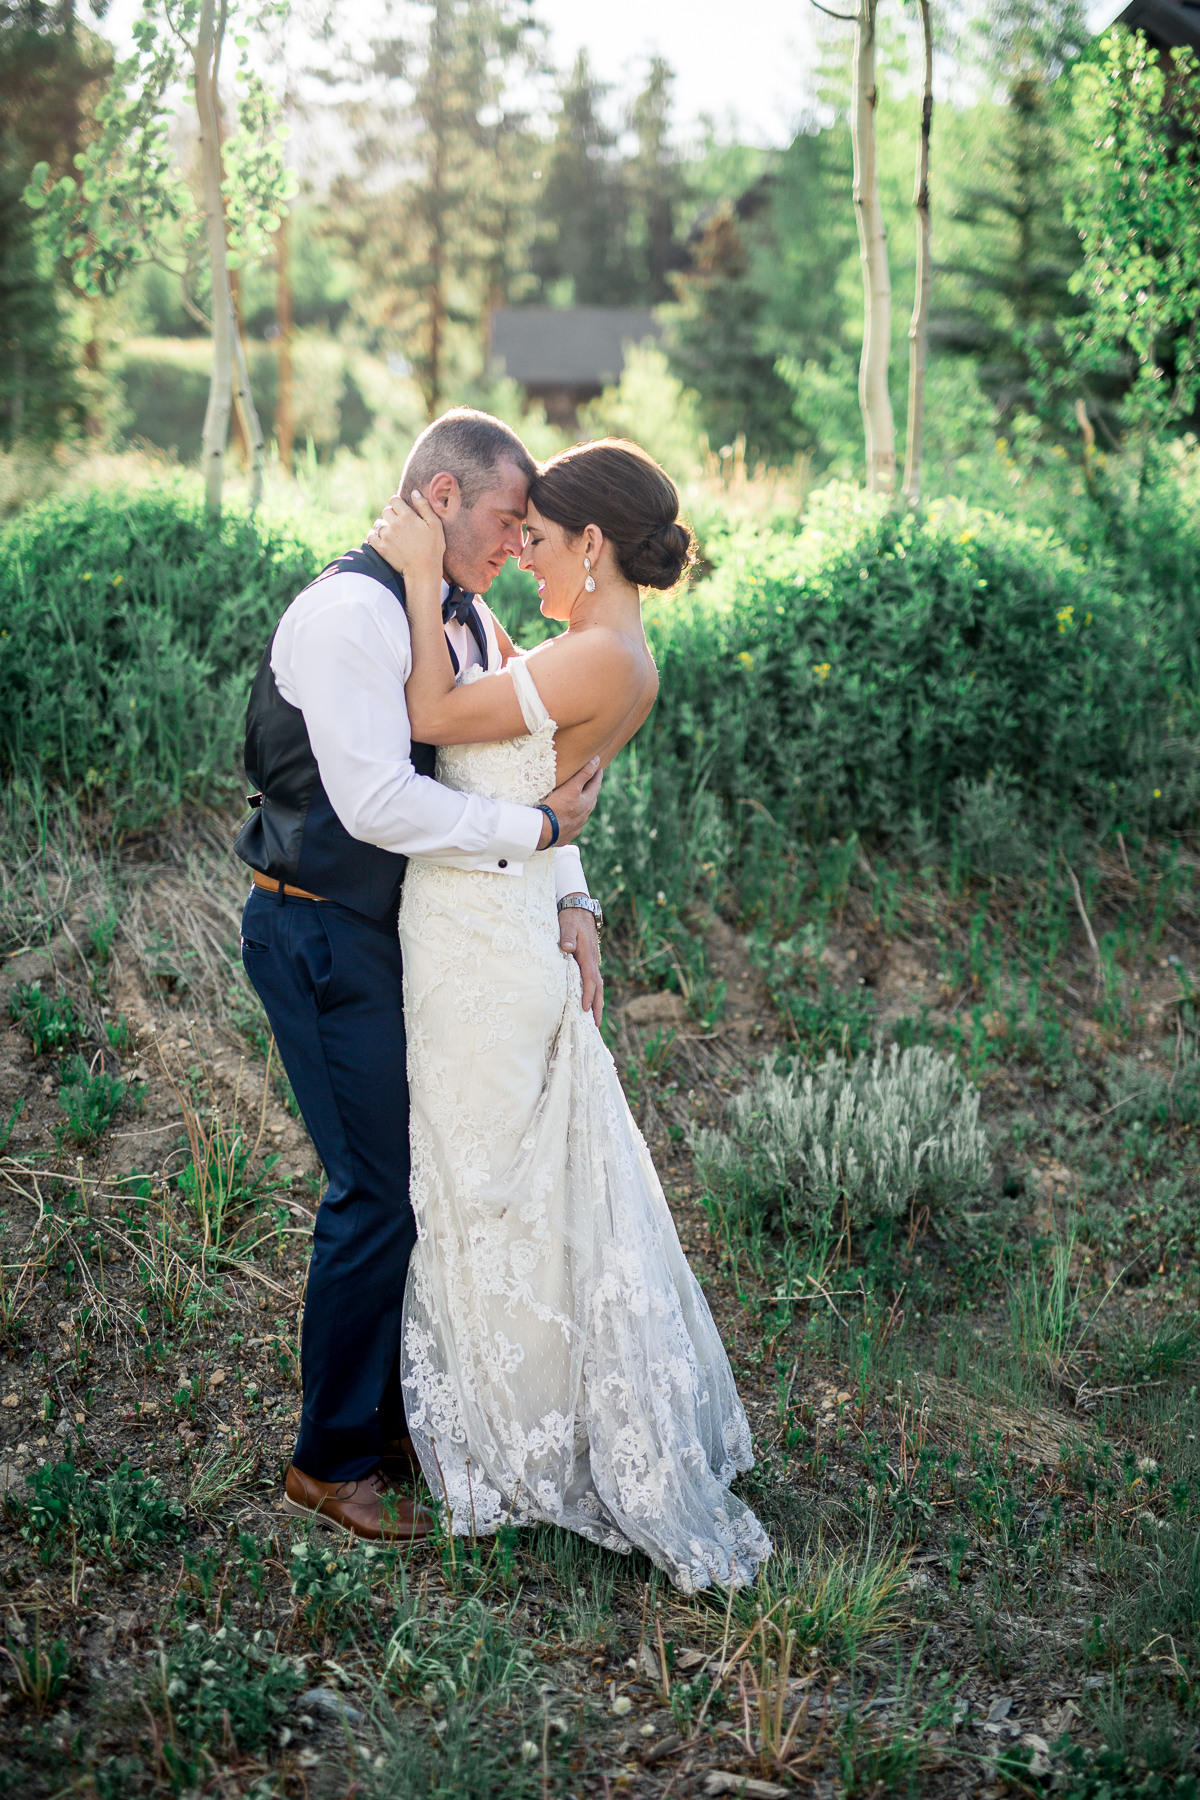 StaciDesign-Colorado-Wedding-5511.jpg